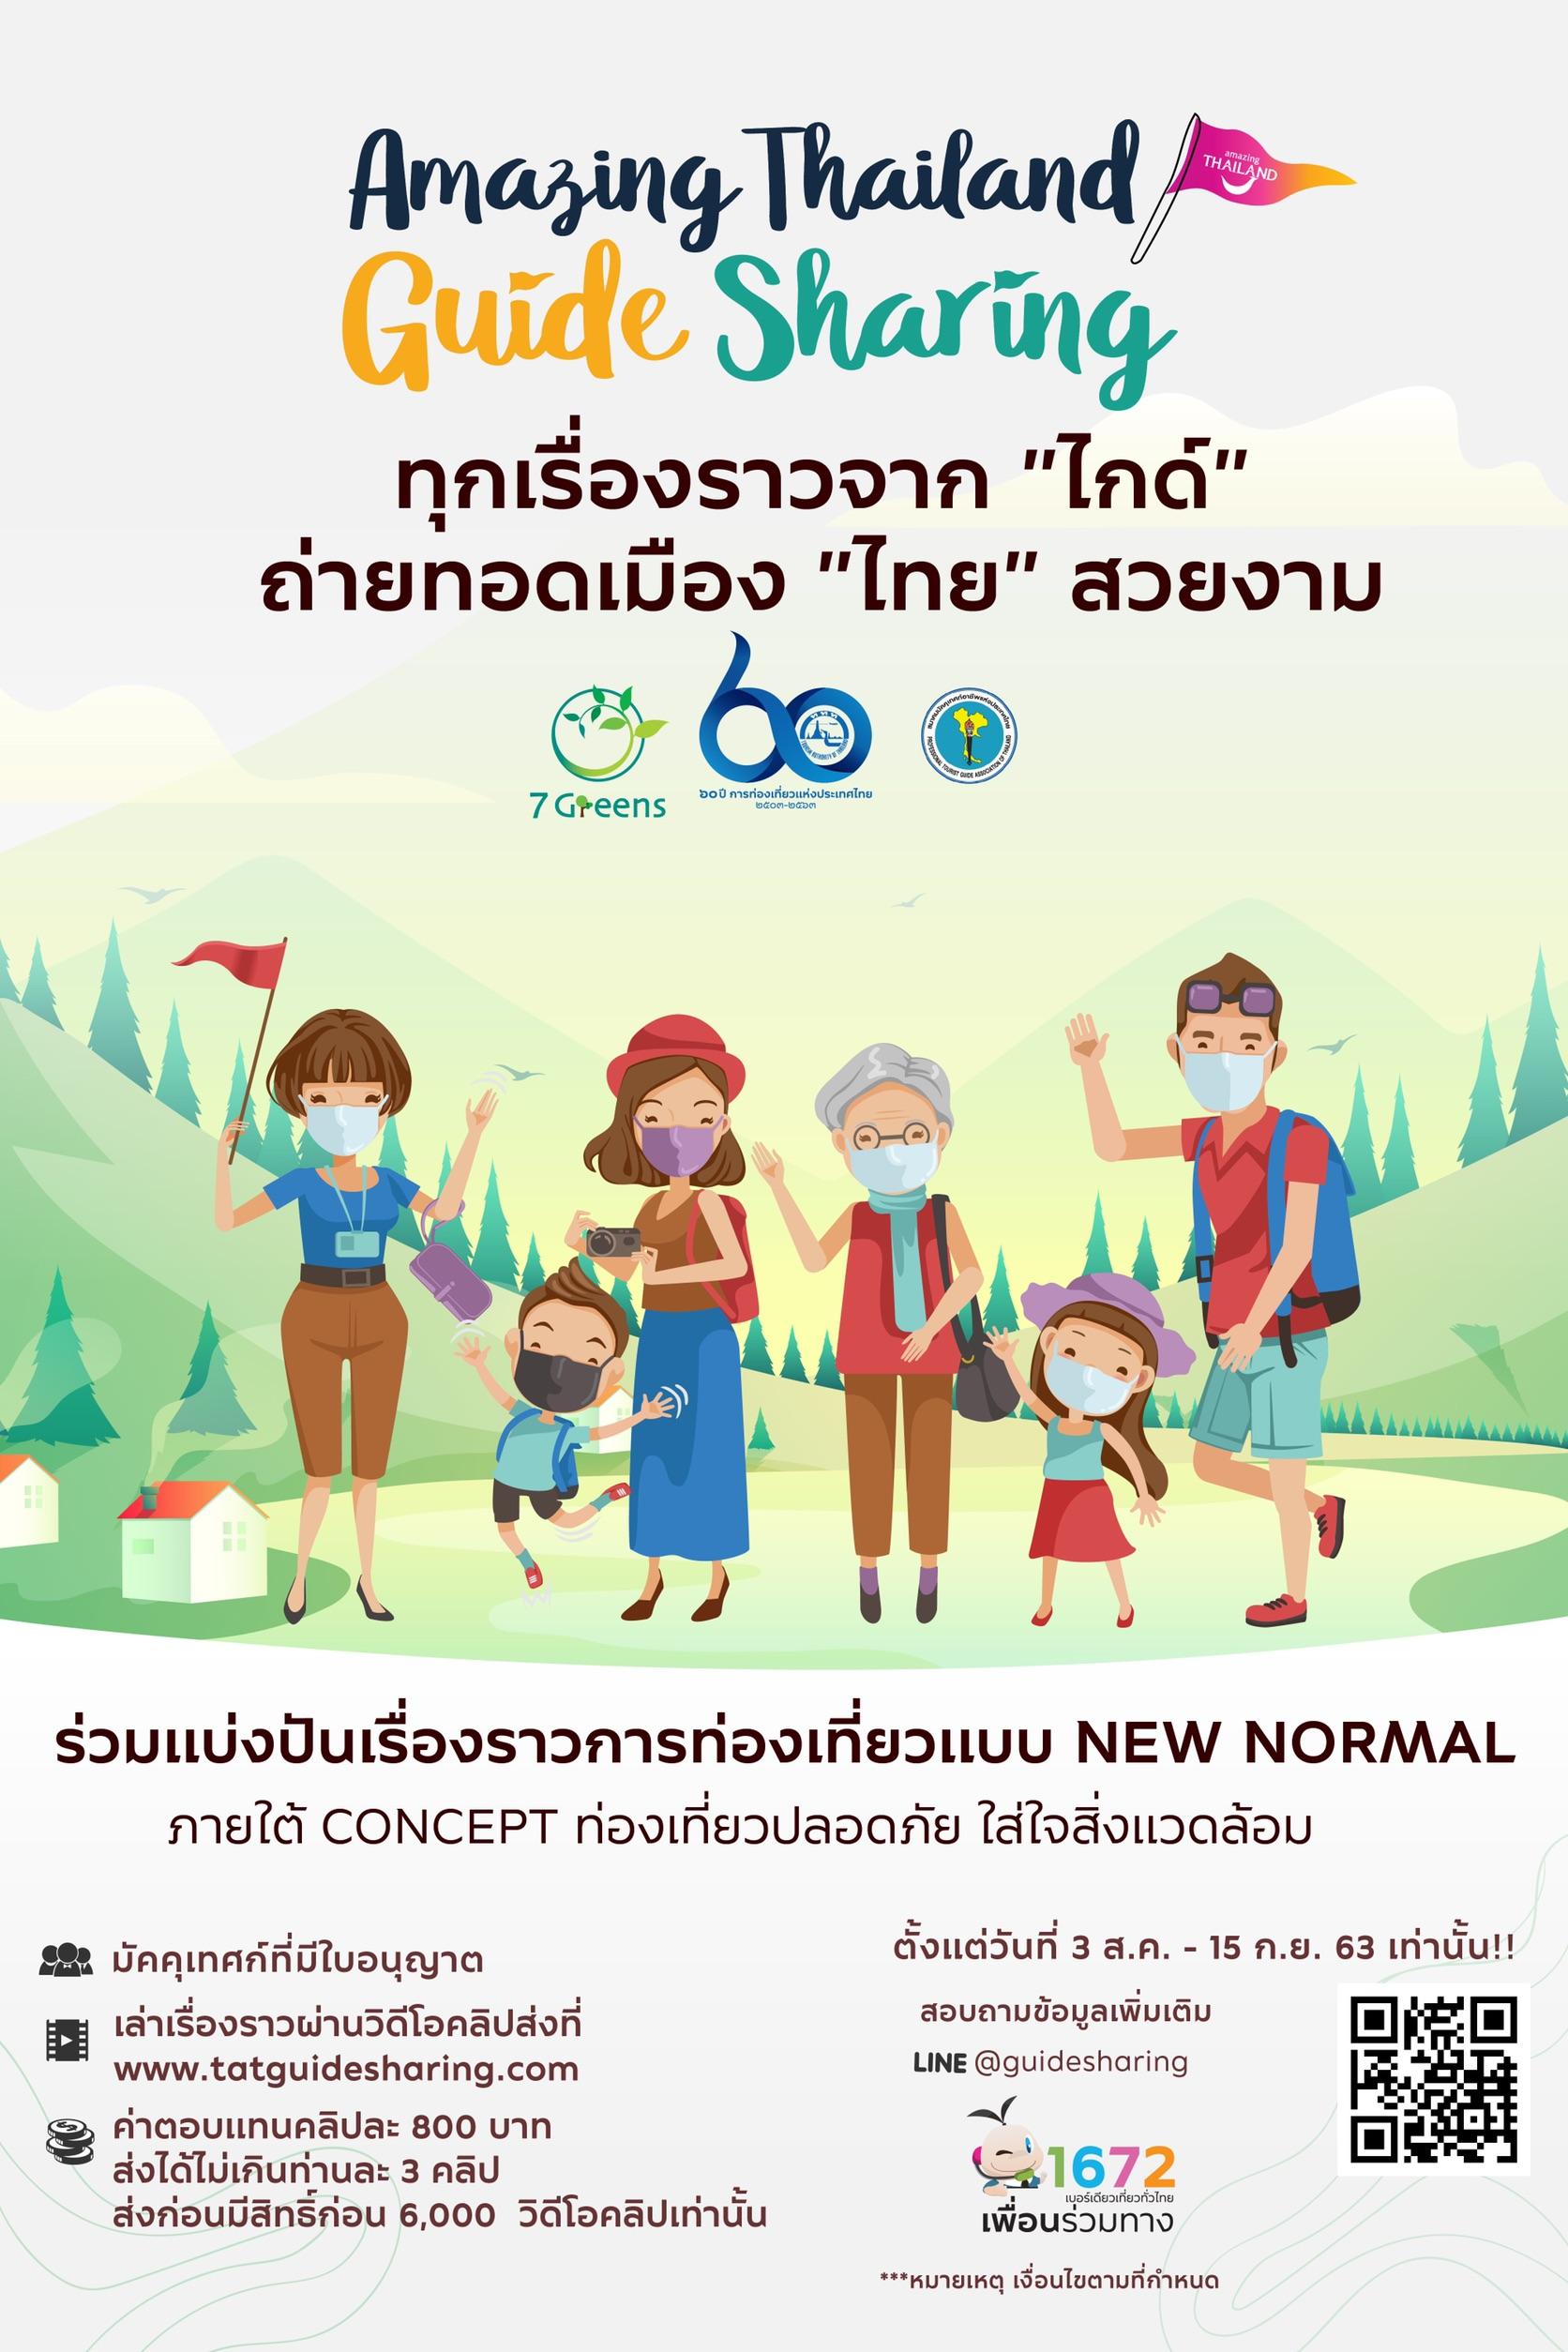 "Amazing Thailand Guide Sharing ""ทุกเรื่องราวจากไกด์ถ่ายทอดเมืองไทยสวยงาม"